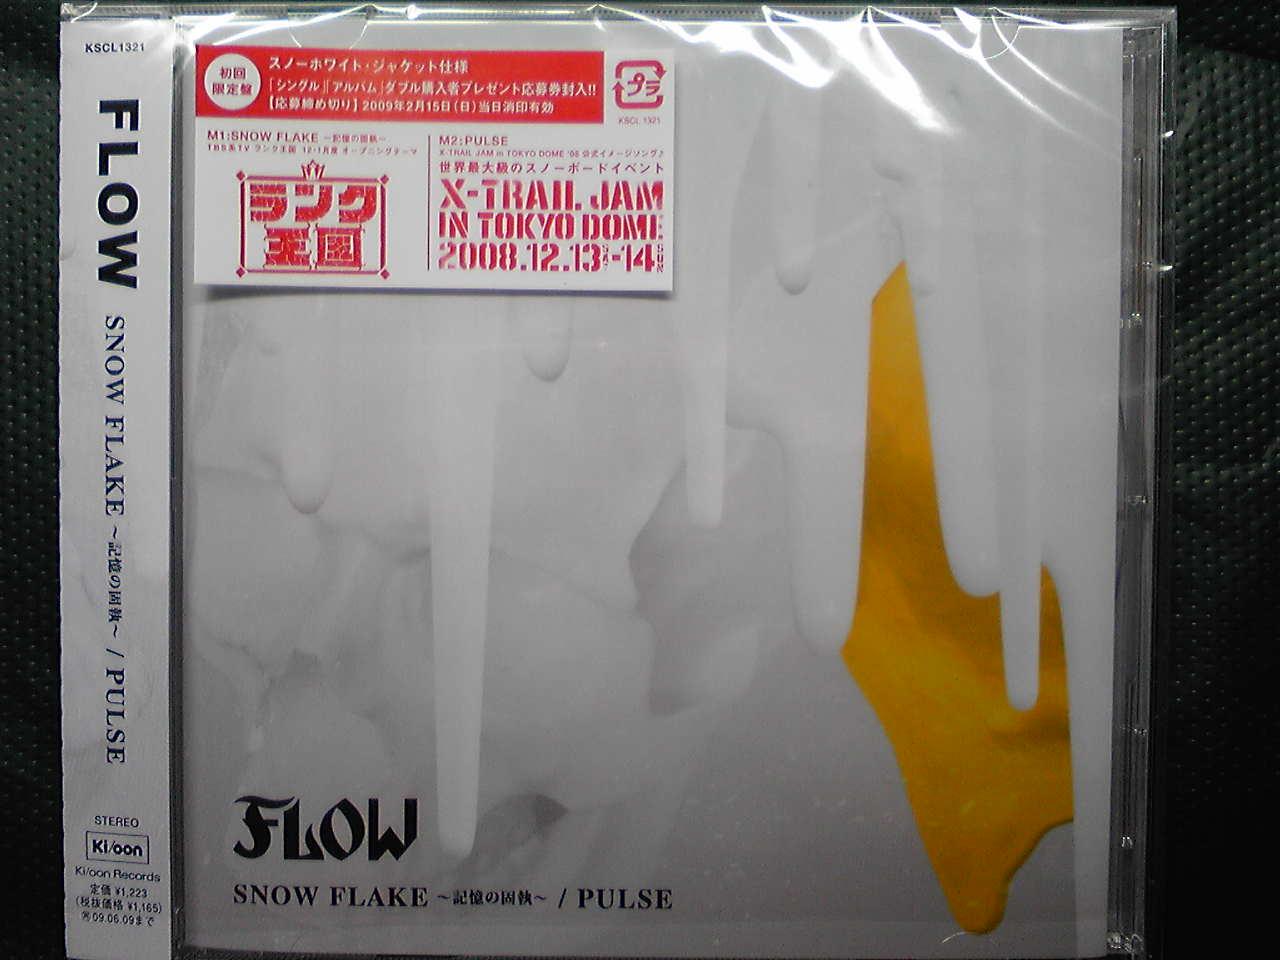 shining☆meteor FLOW「SNOW FLAKE?記憶の固執?/PULSE」&サイトジャック